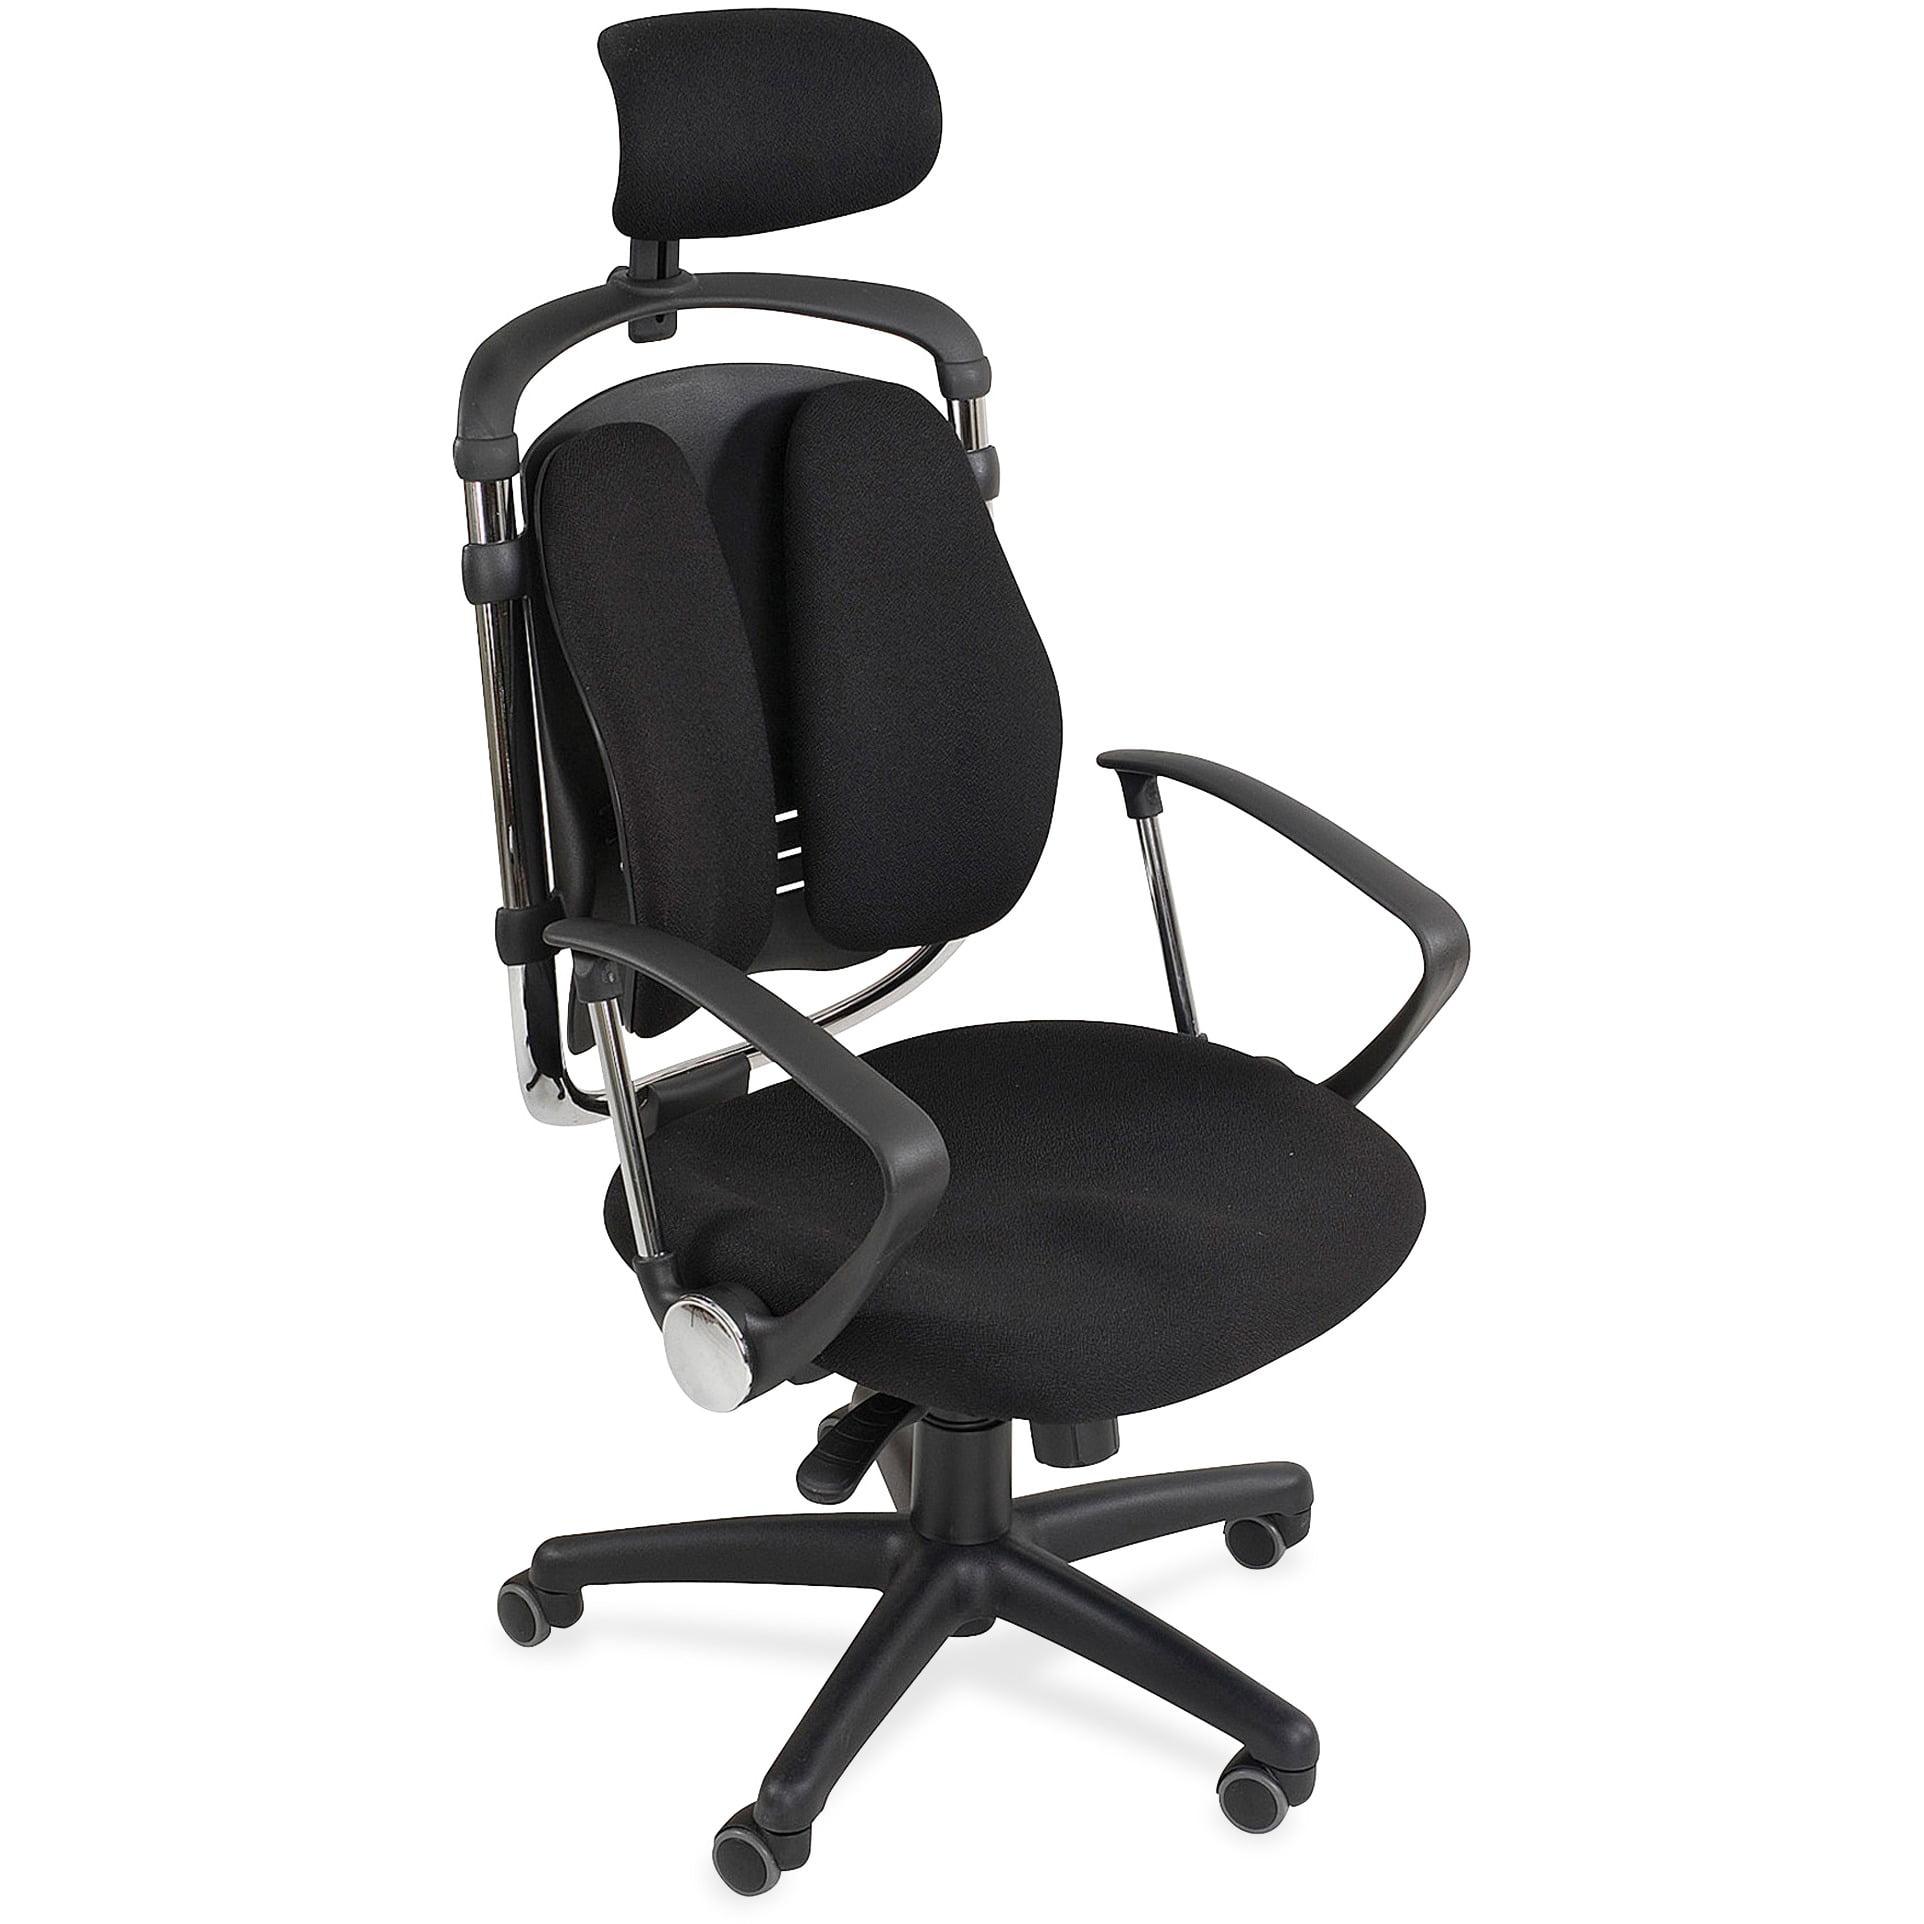 Balt Spine Align Executive Chair, Black